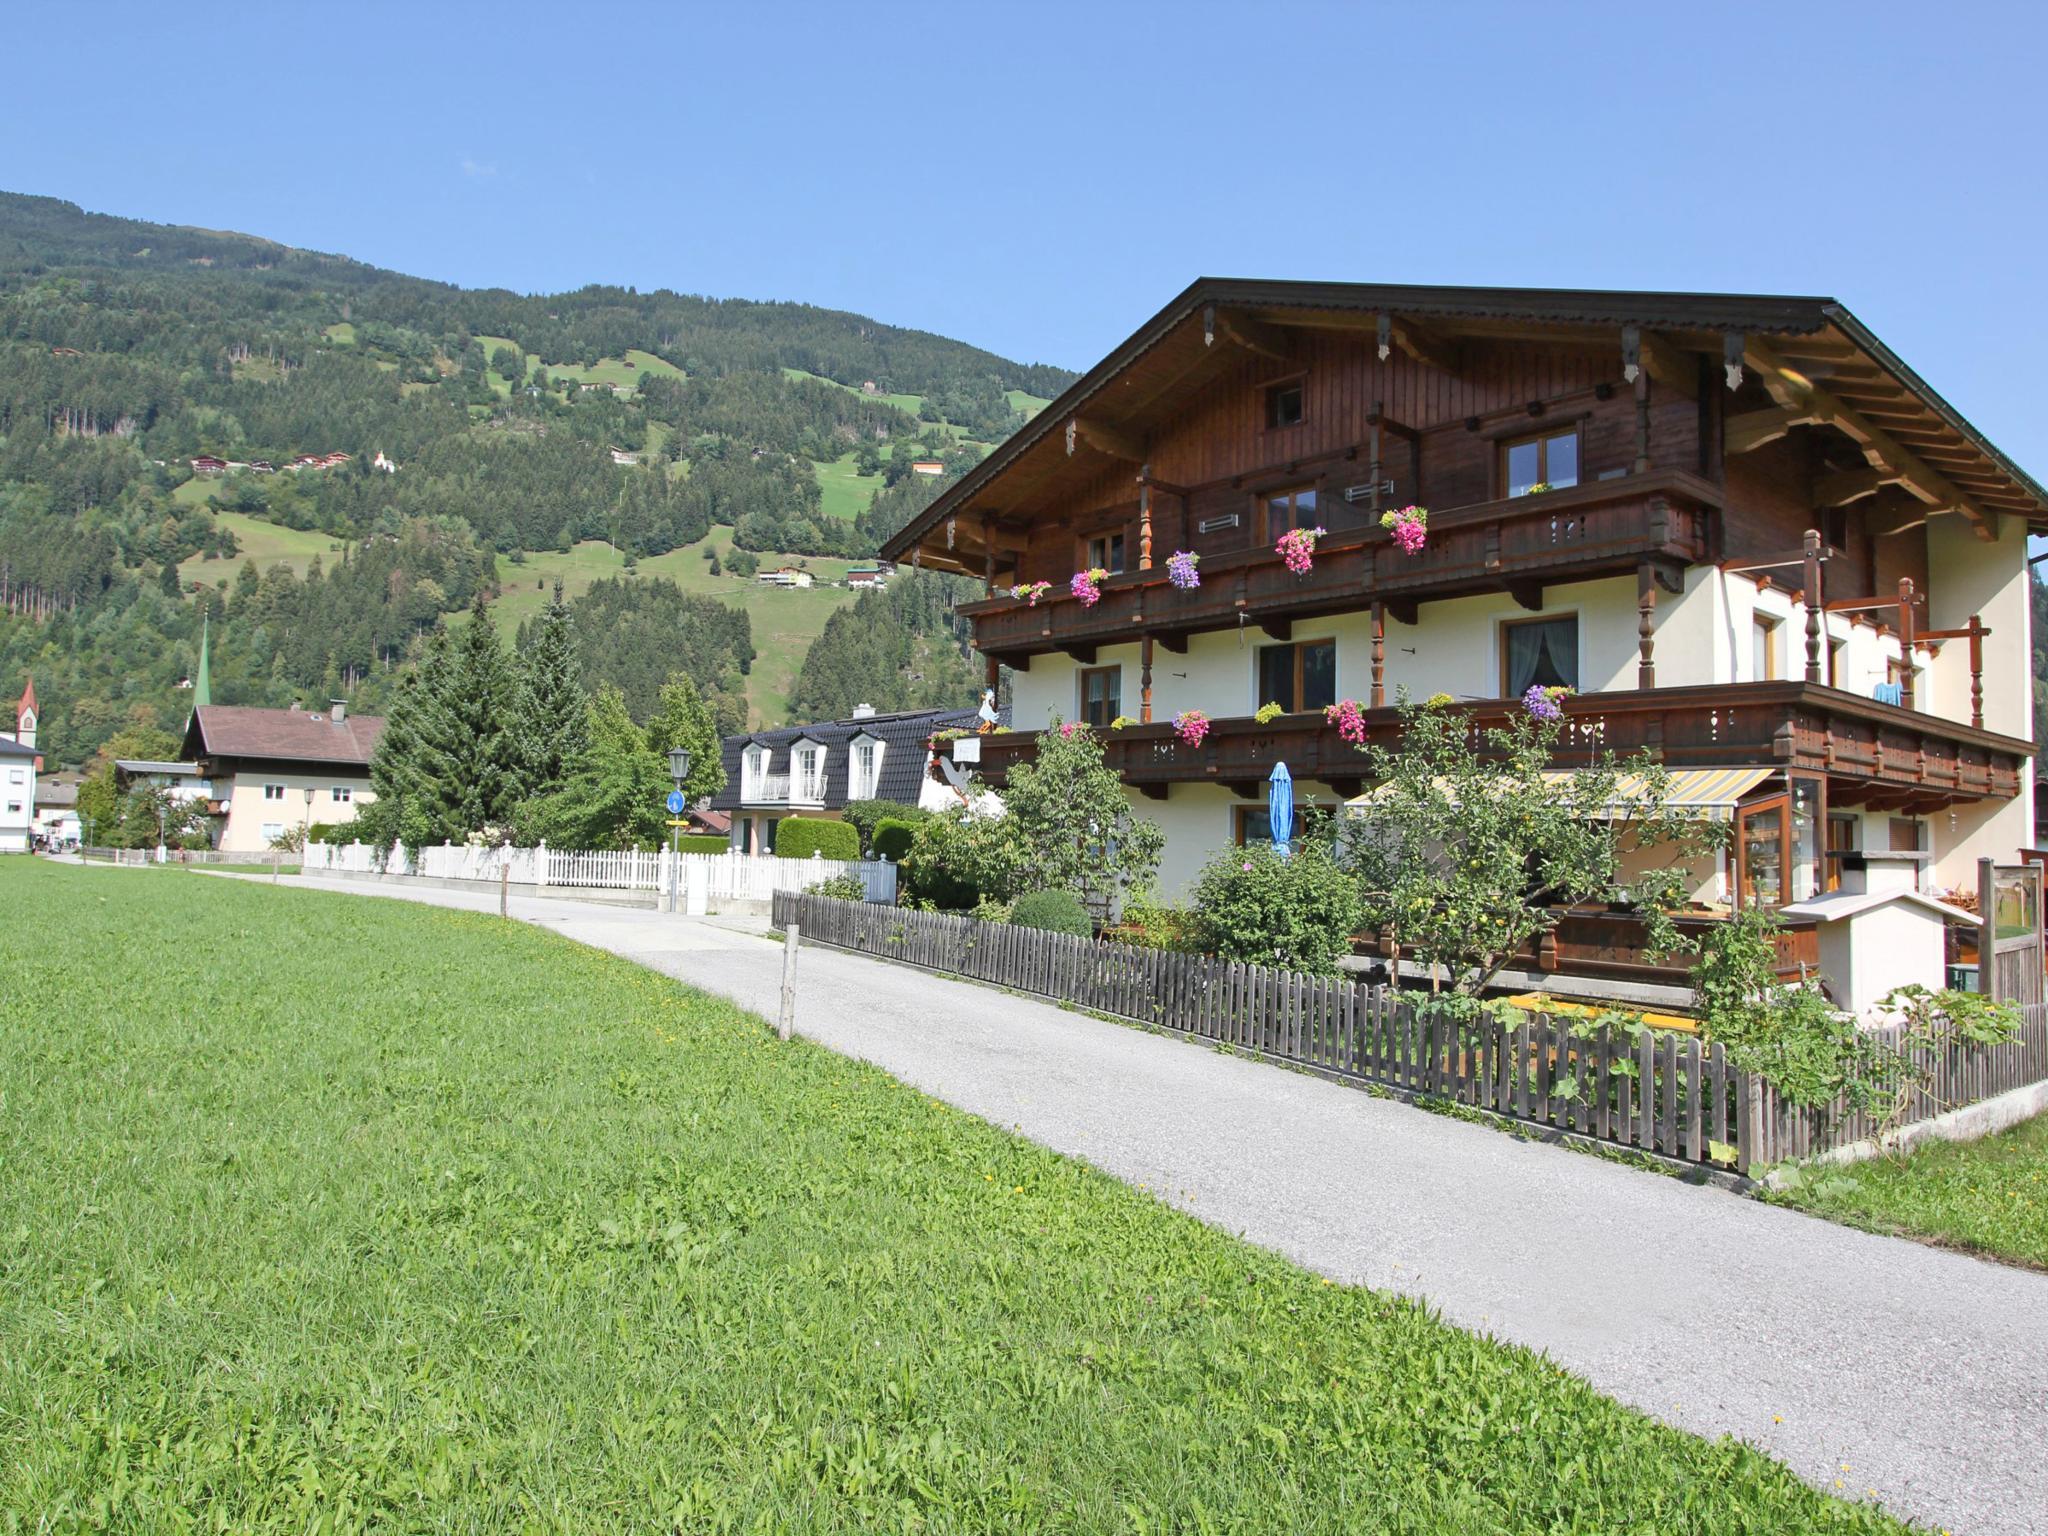 Fankhauser II Tirol